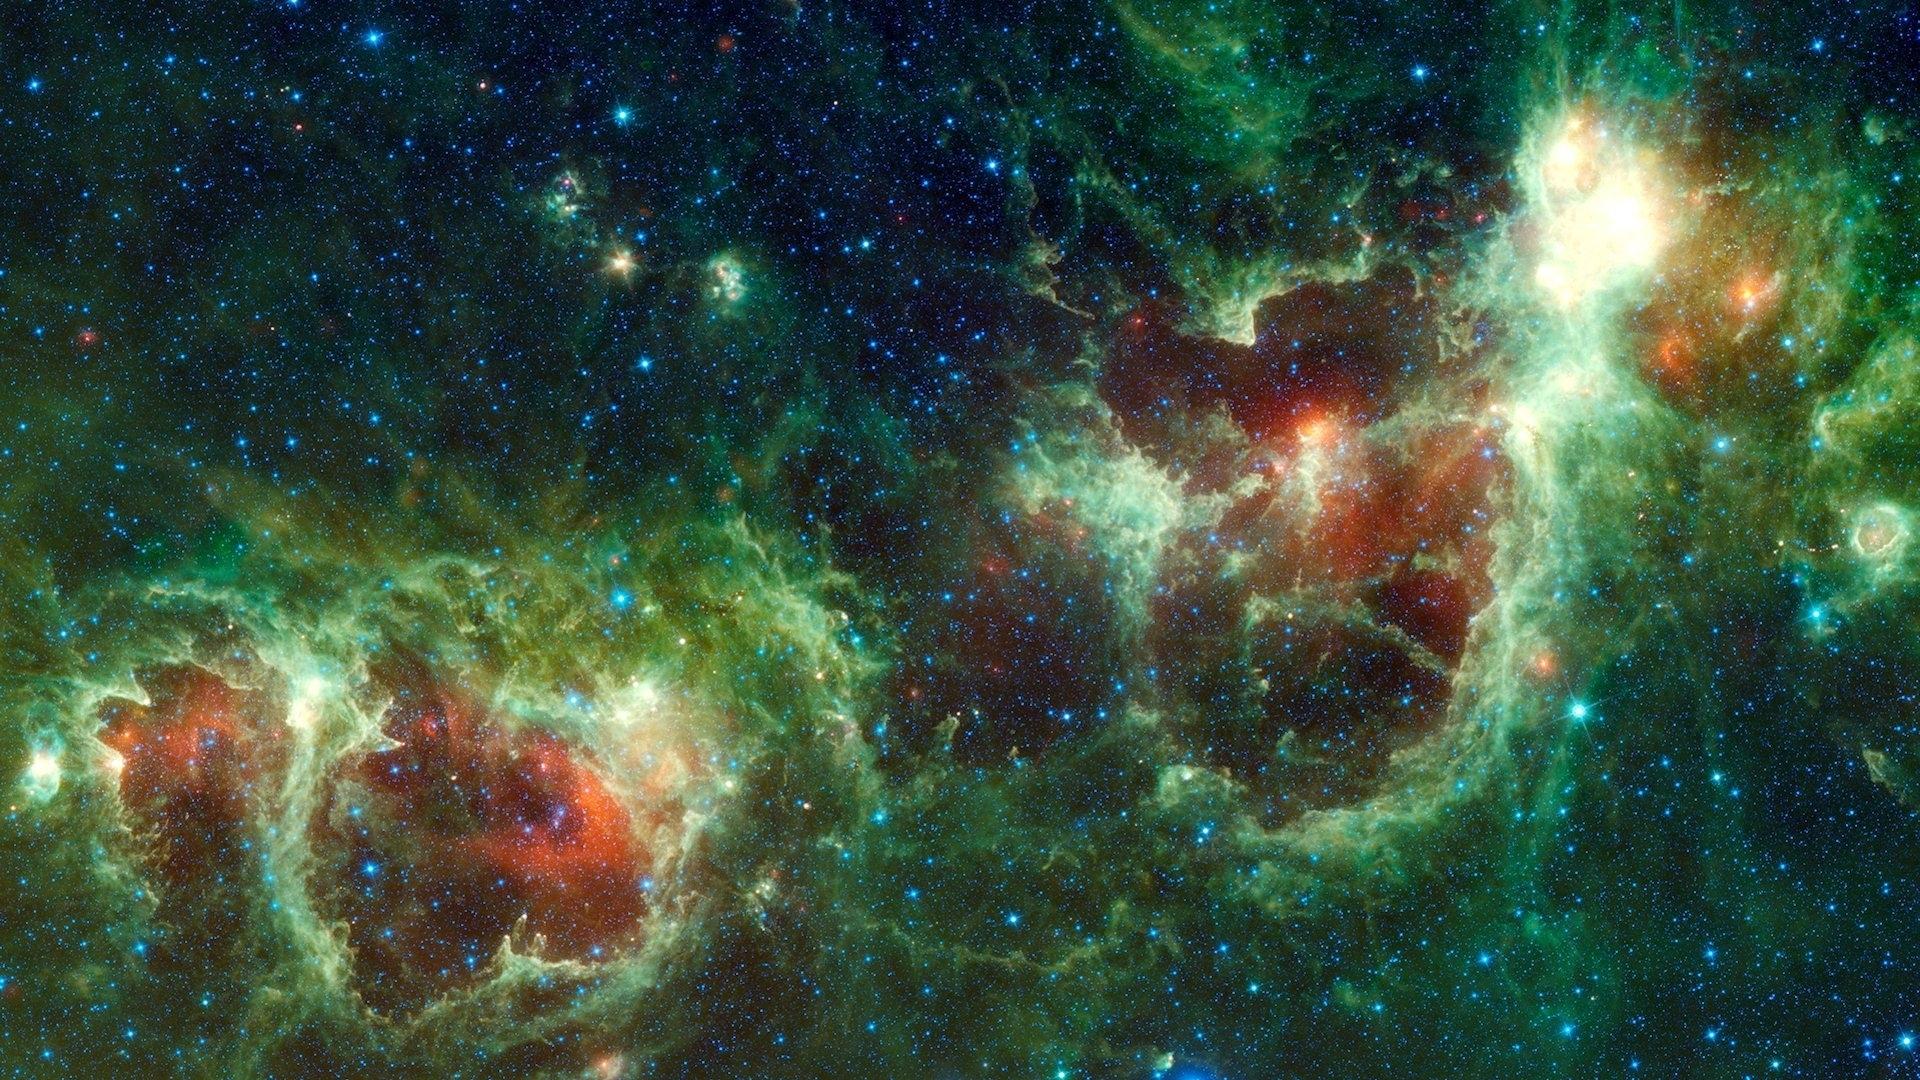 heart and soul nebula - walldevil